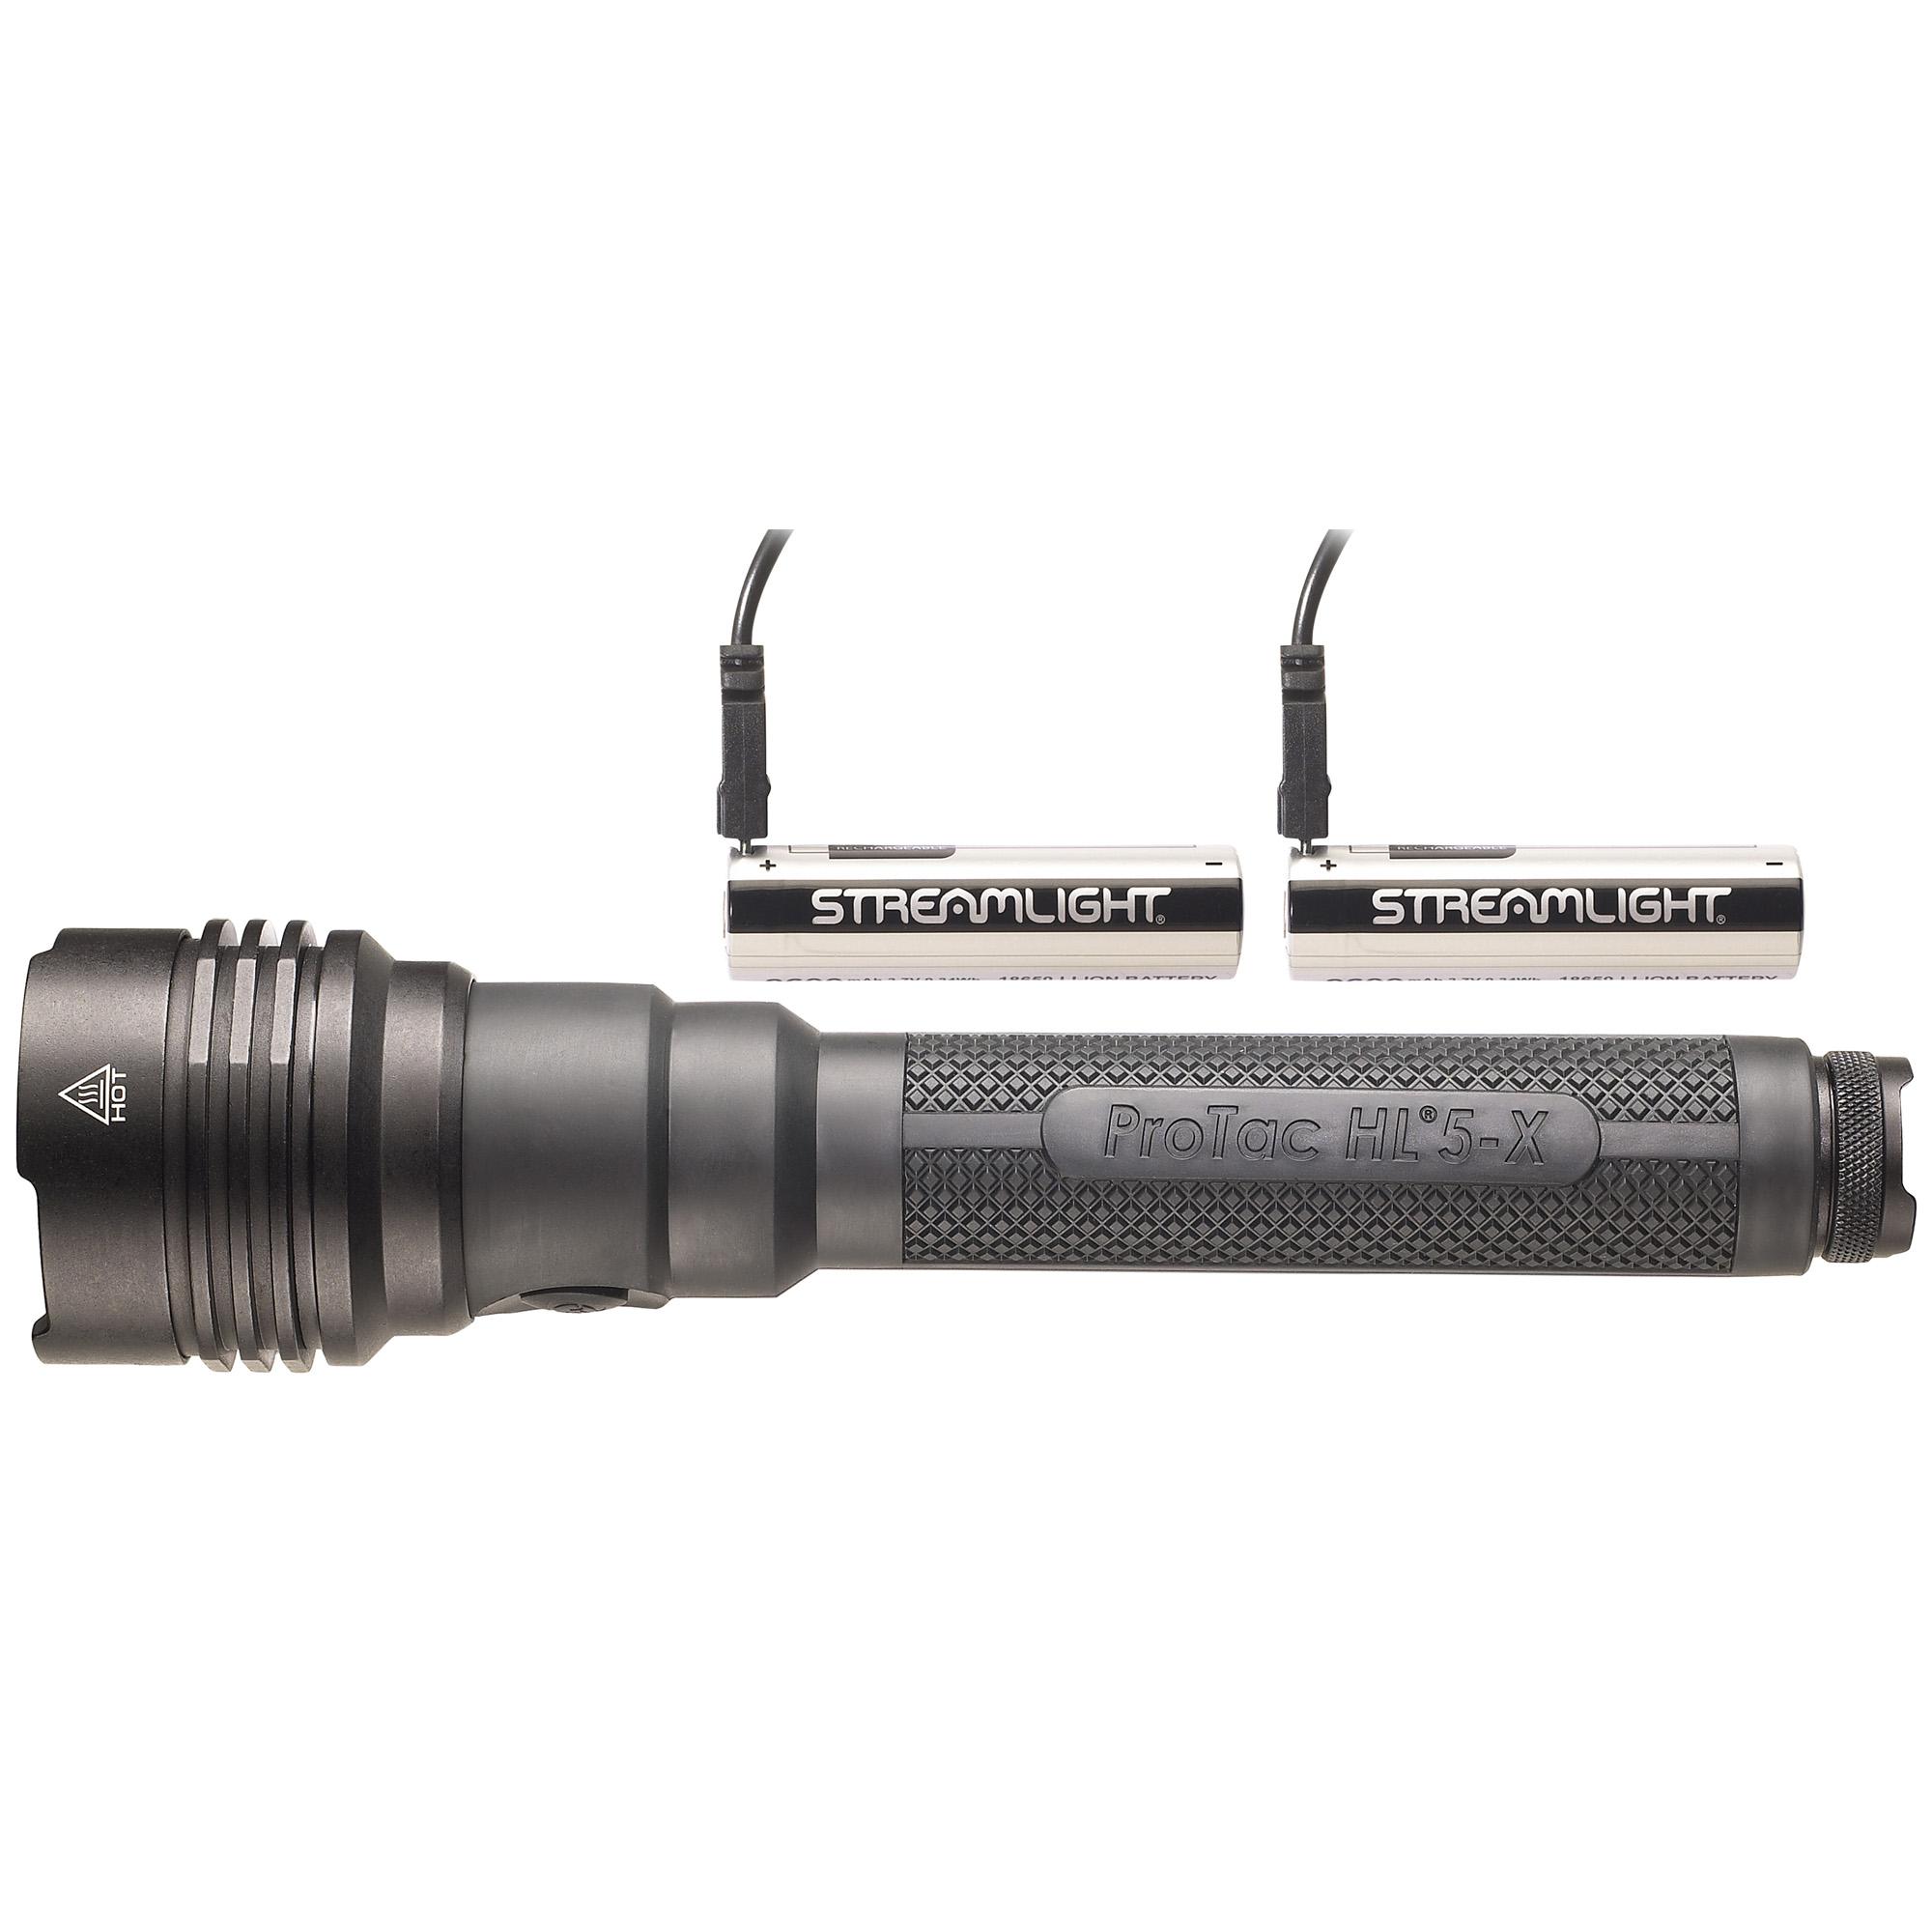 Streamlight ProTac HL 5-X USB Flashlight 3500 Lumens w  USB Battery Black by Streamlight